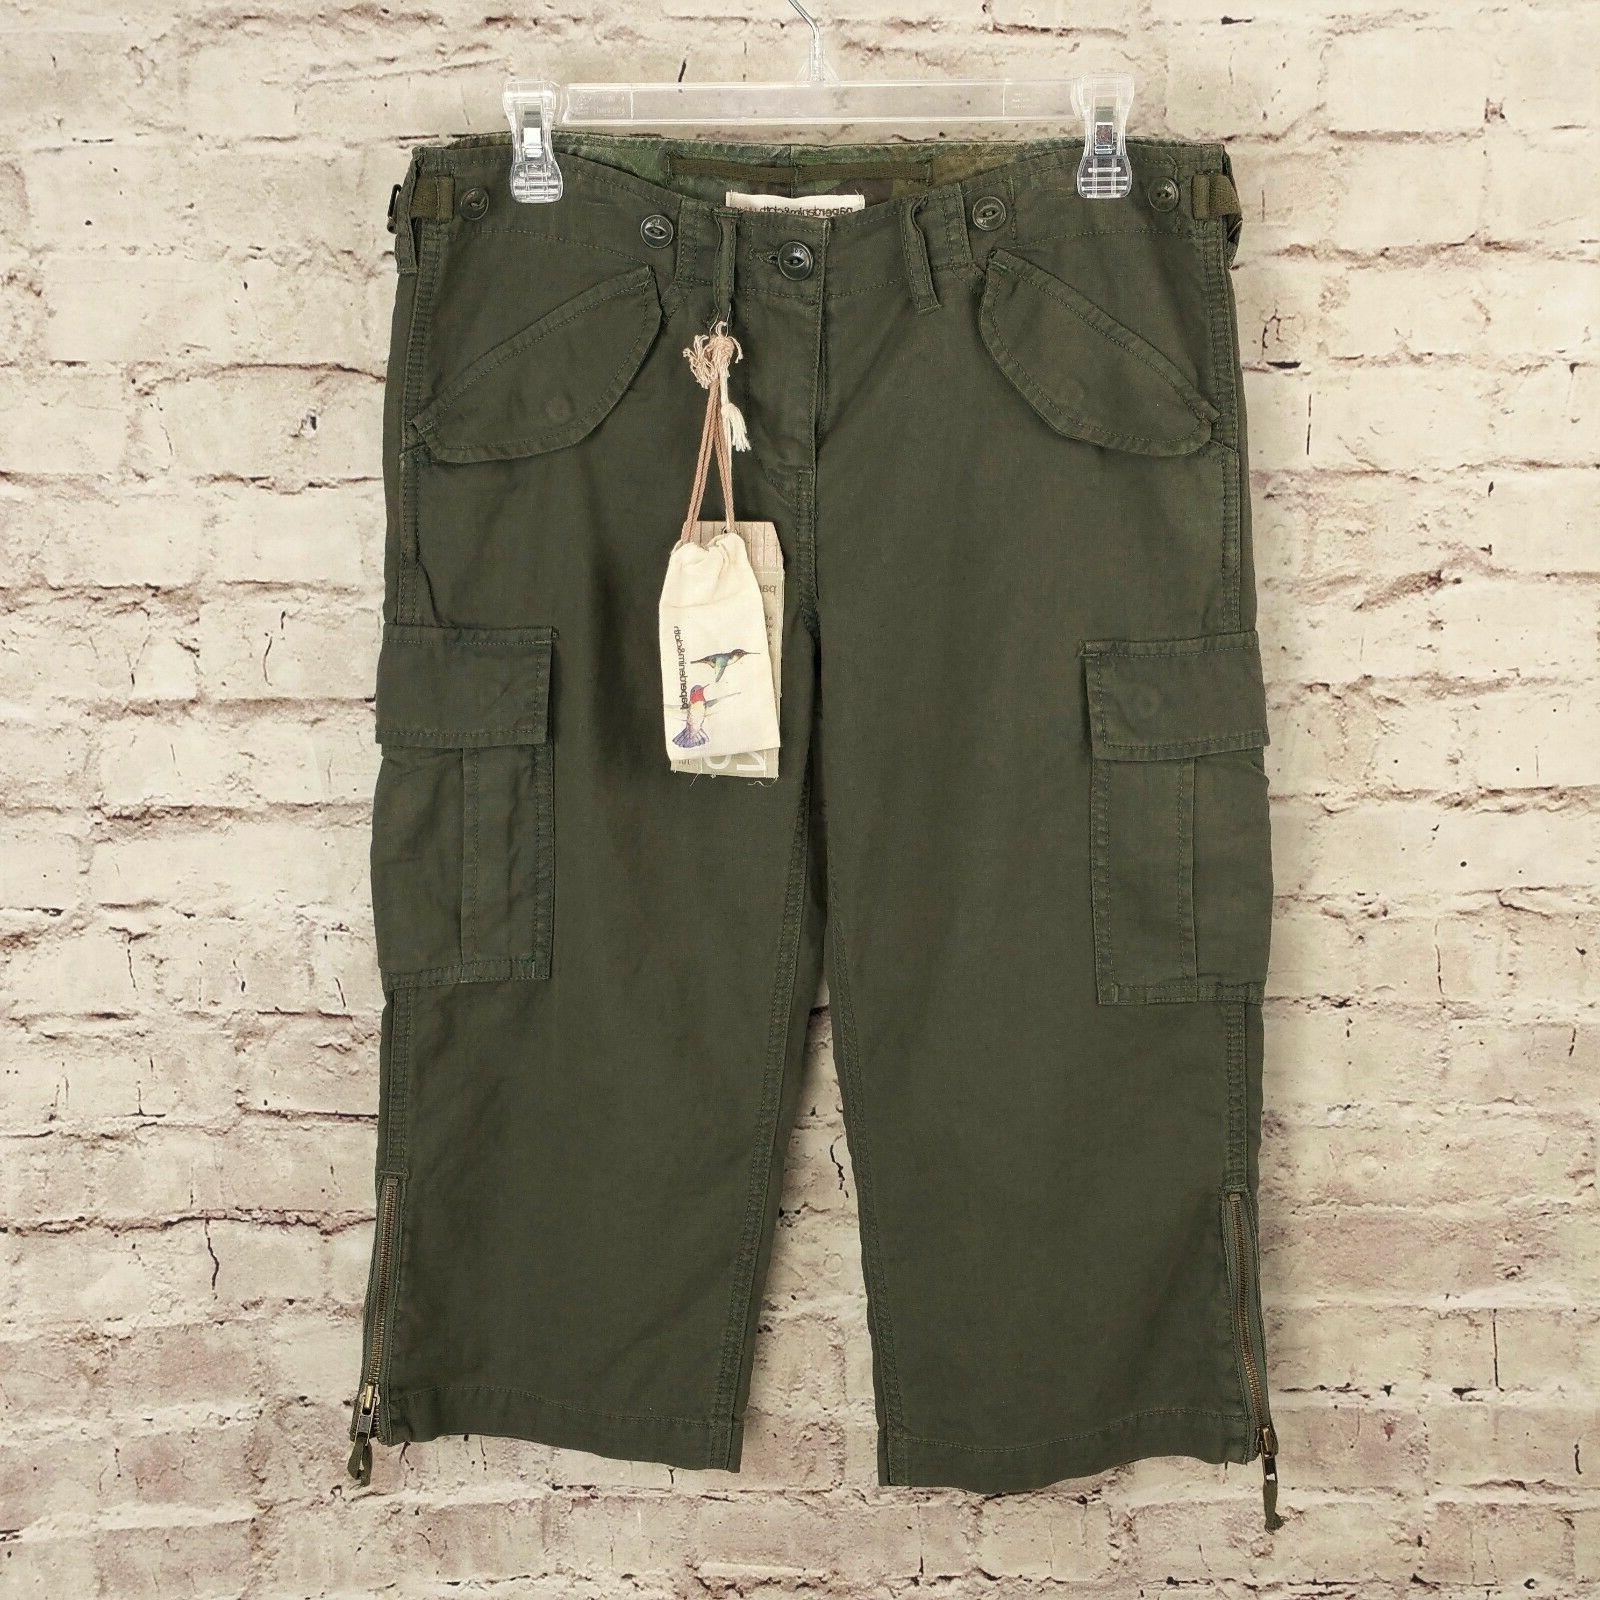 Paper Denim & Cloth Cargo Capri Pants Womens 26 27 Military